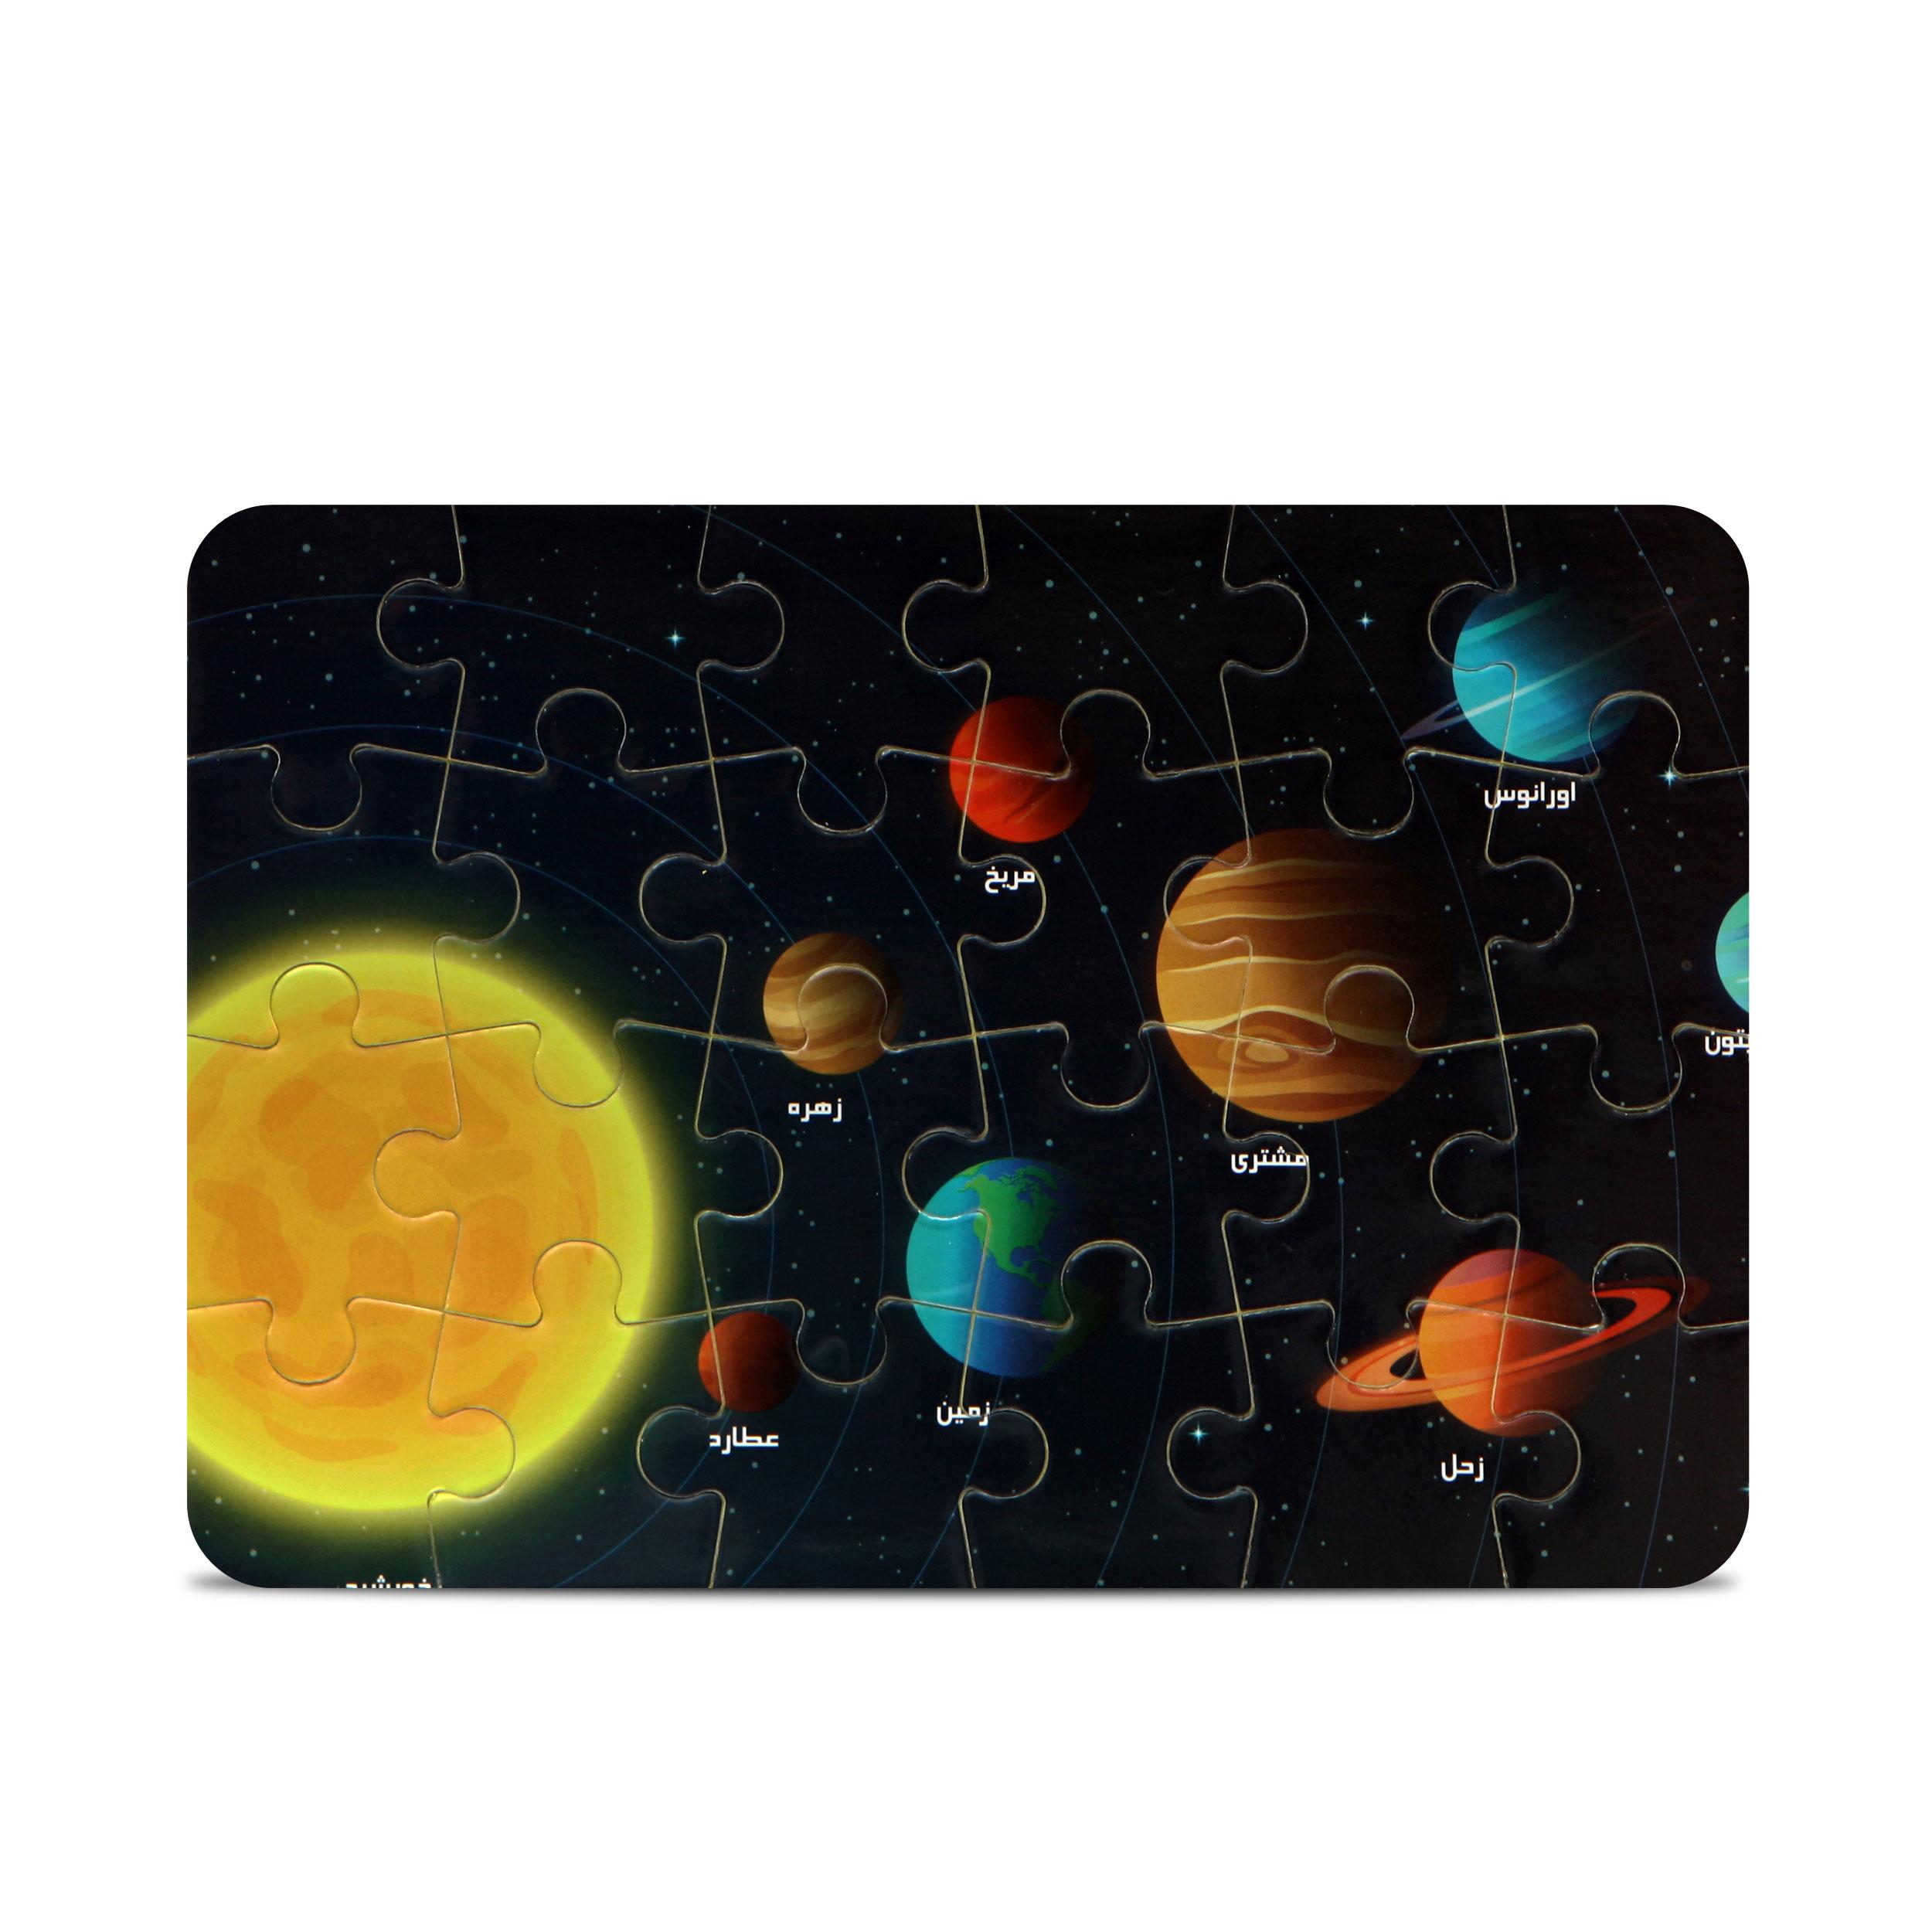 پازل-۲۴-تکه-طرح-کهکشان-پیرامون-2